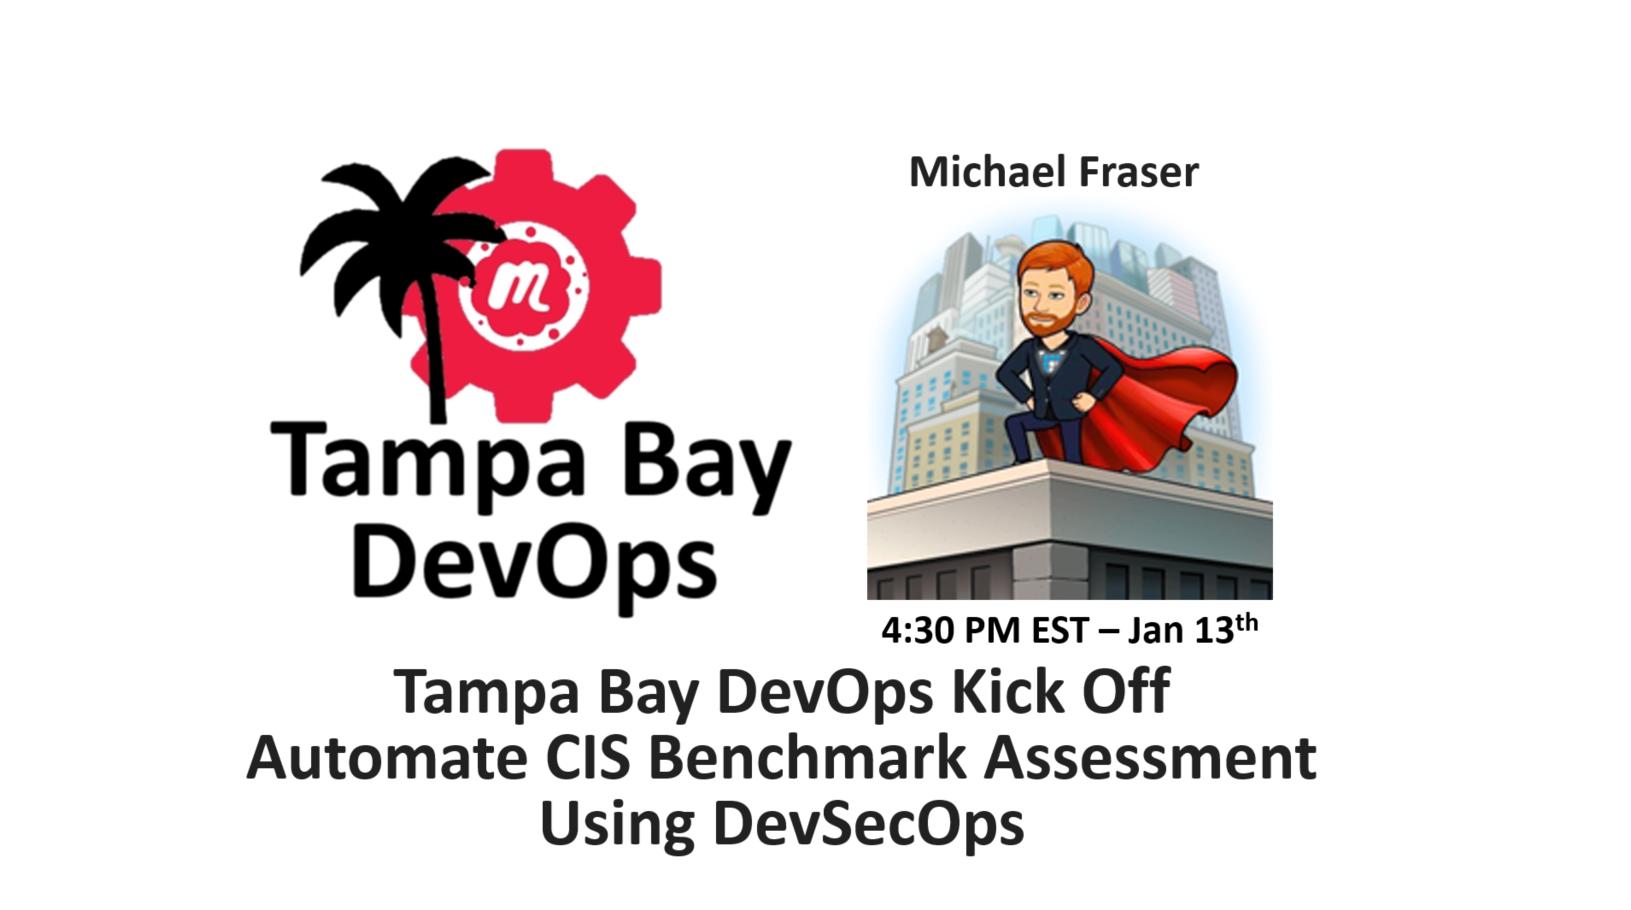 Tampa Bay DevOps DevSecOps